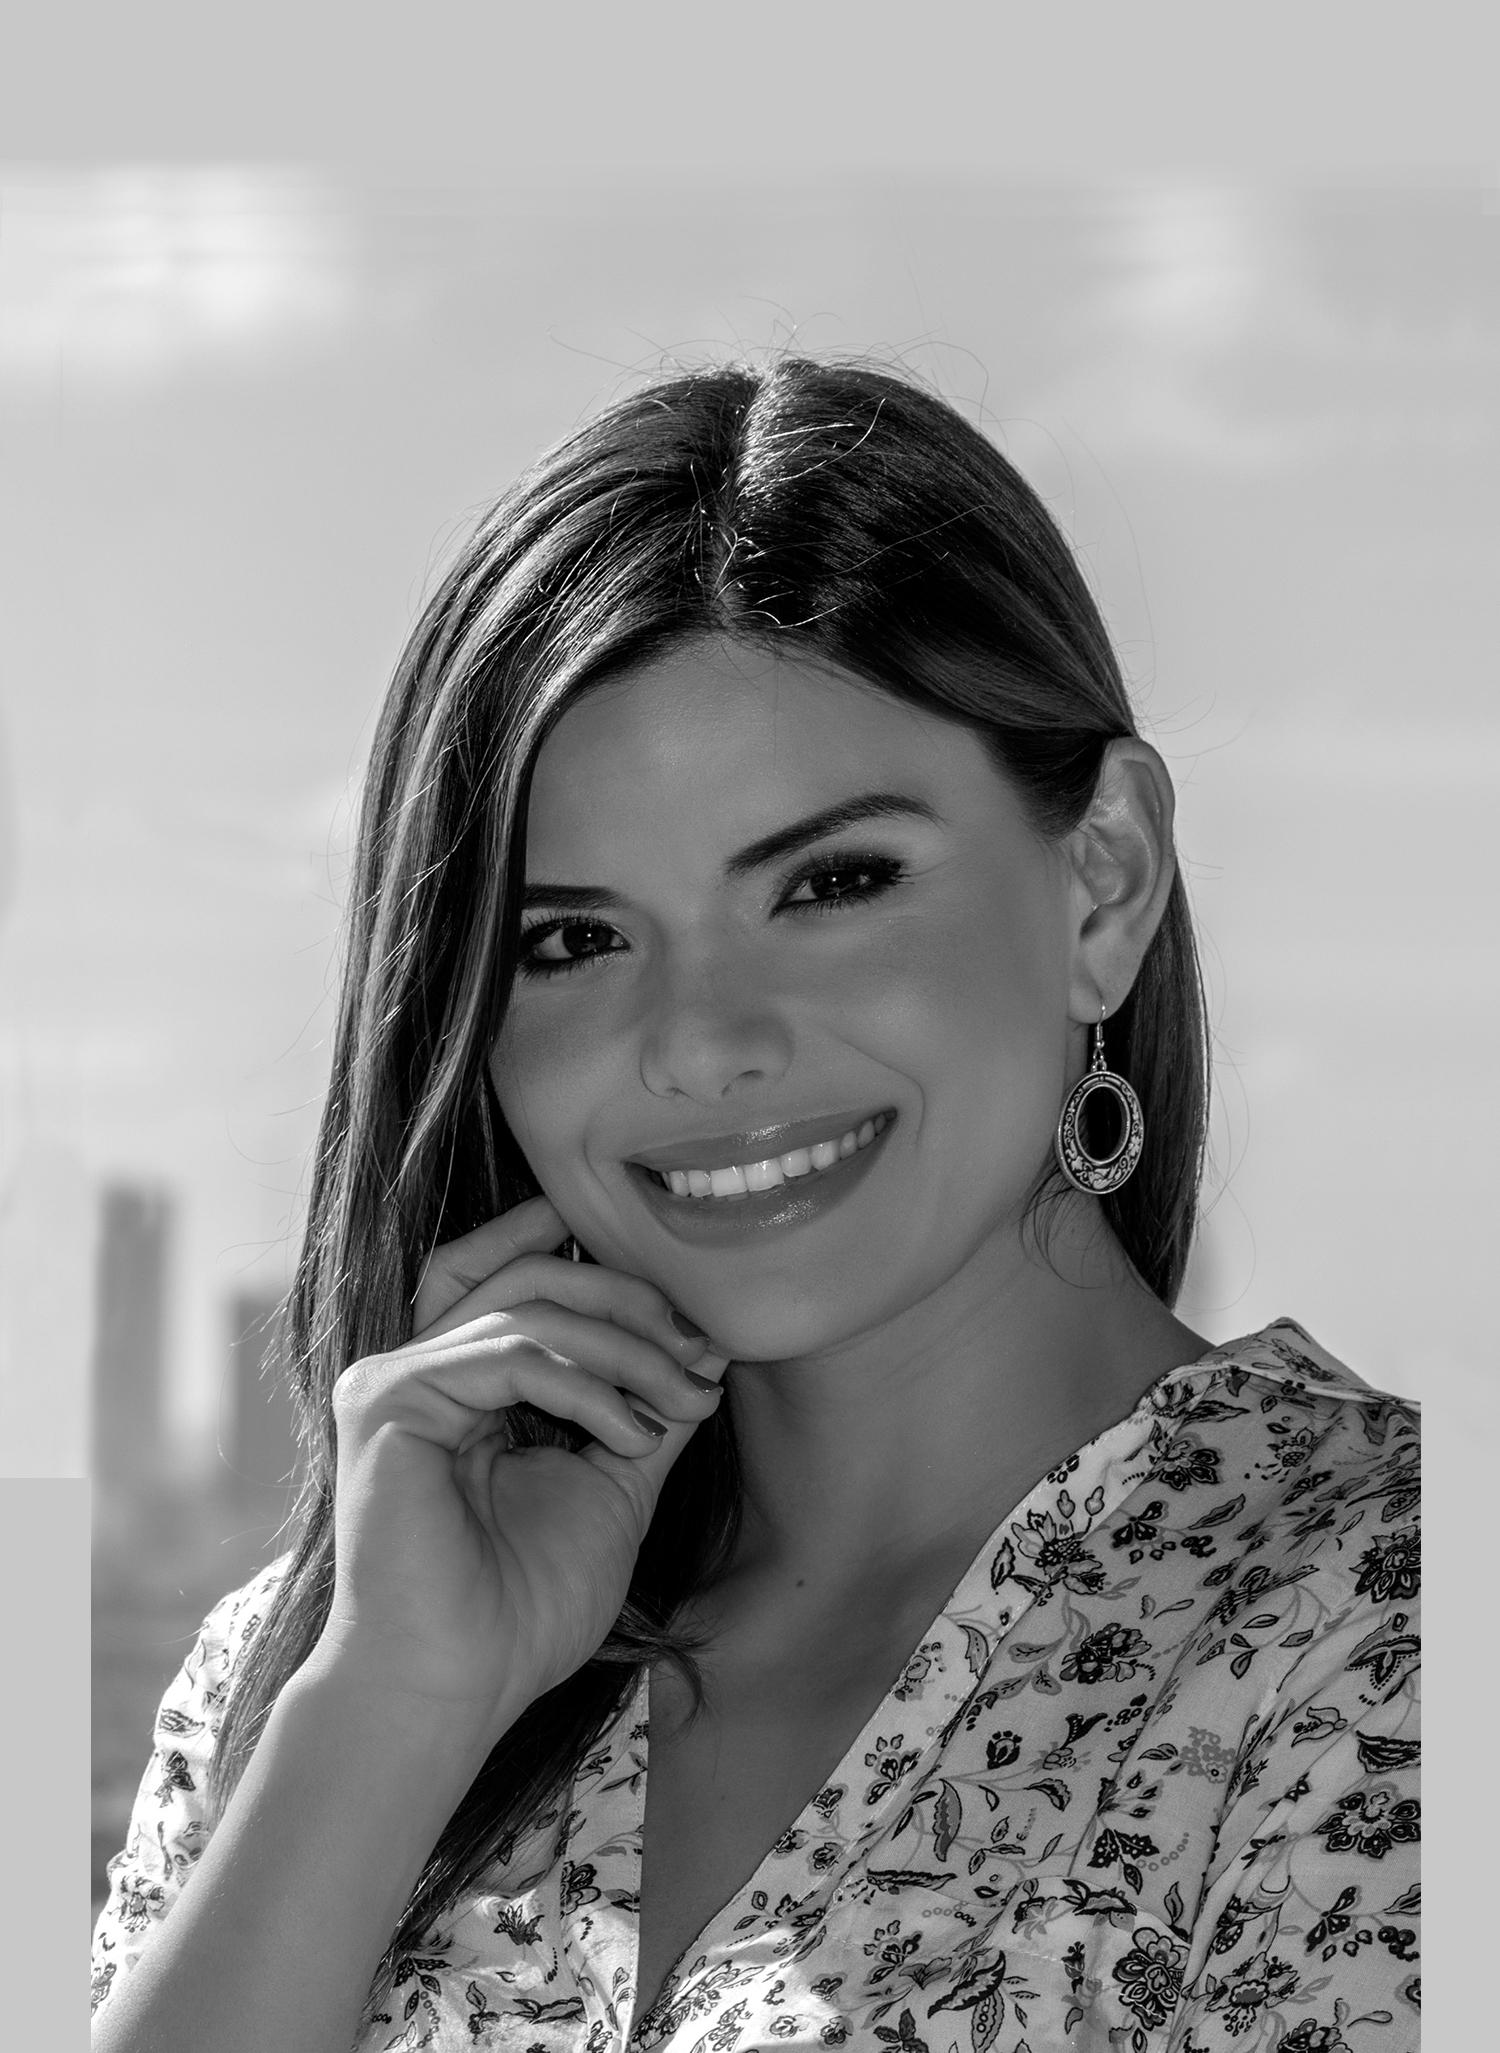 Gretchen Cabrera